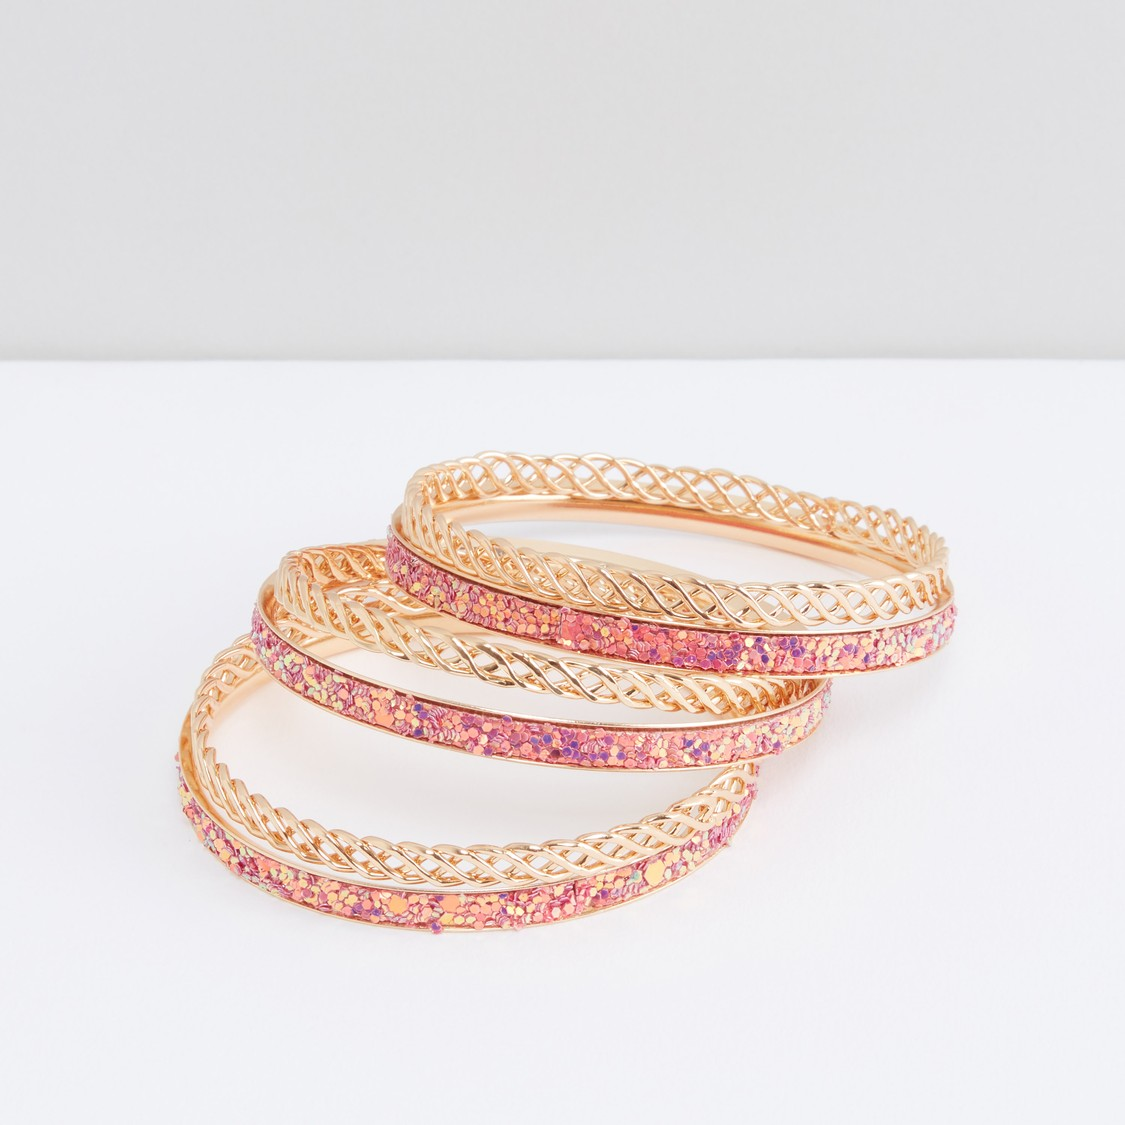 Decorative Bangle - Set of 6